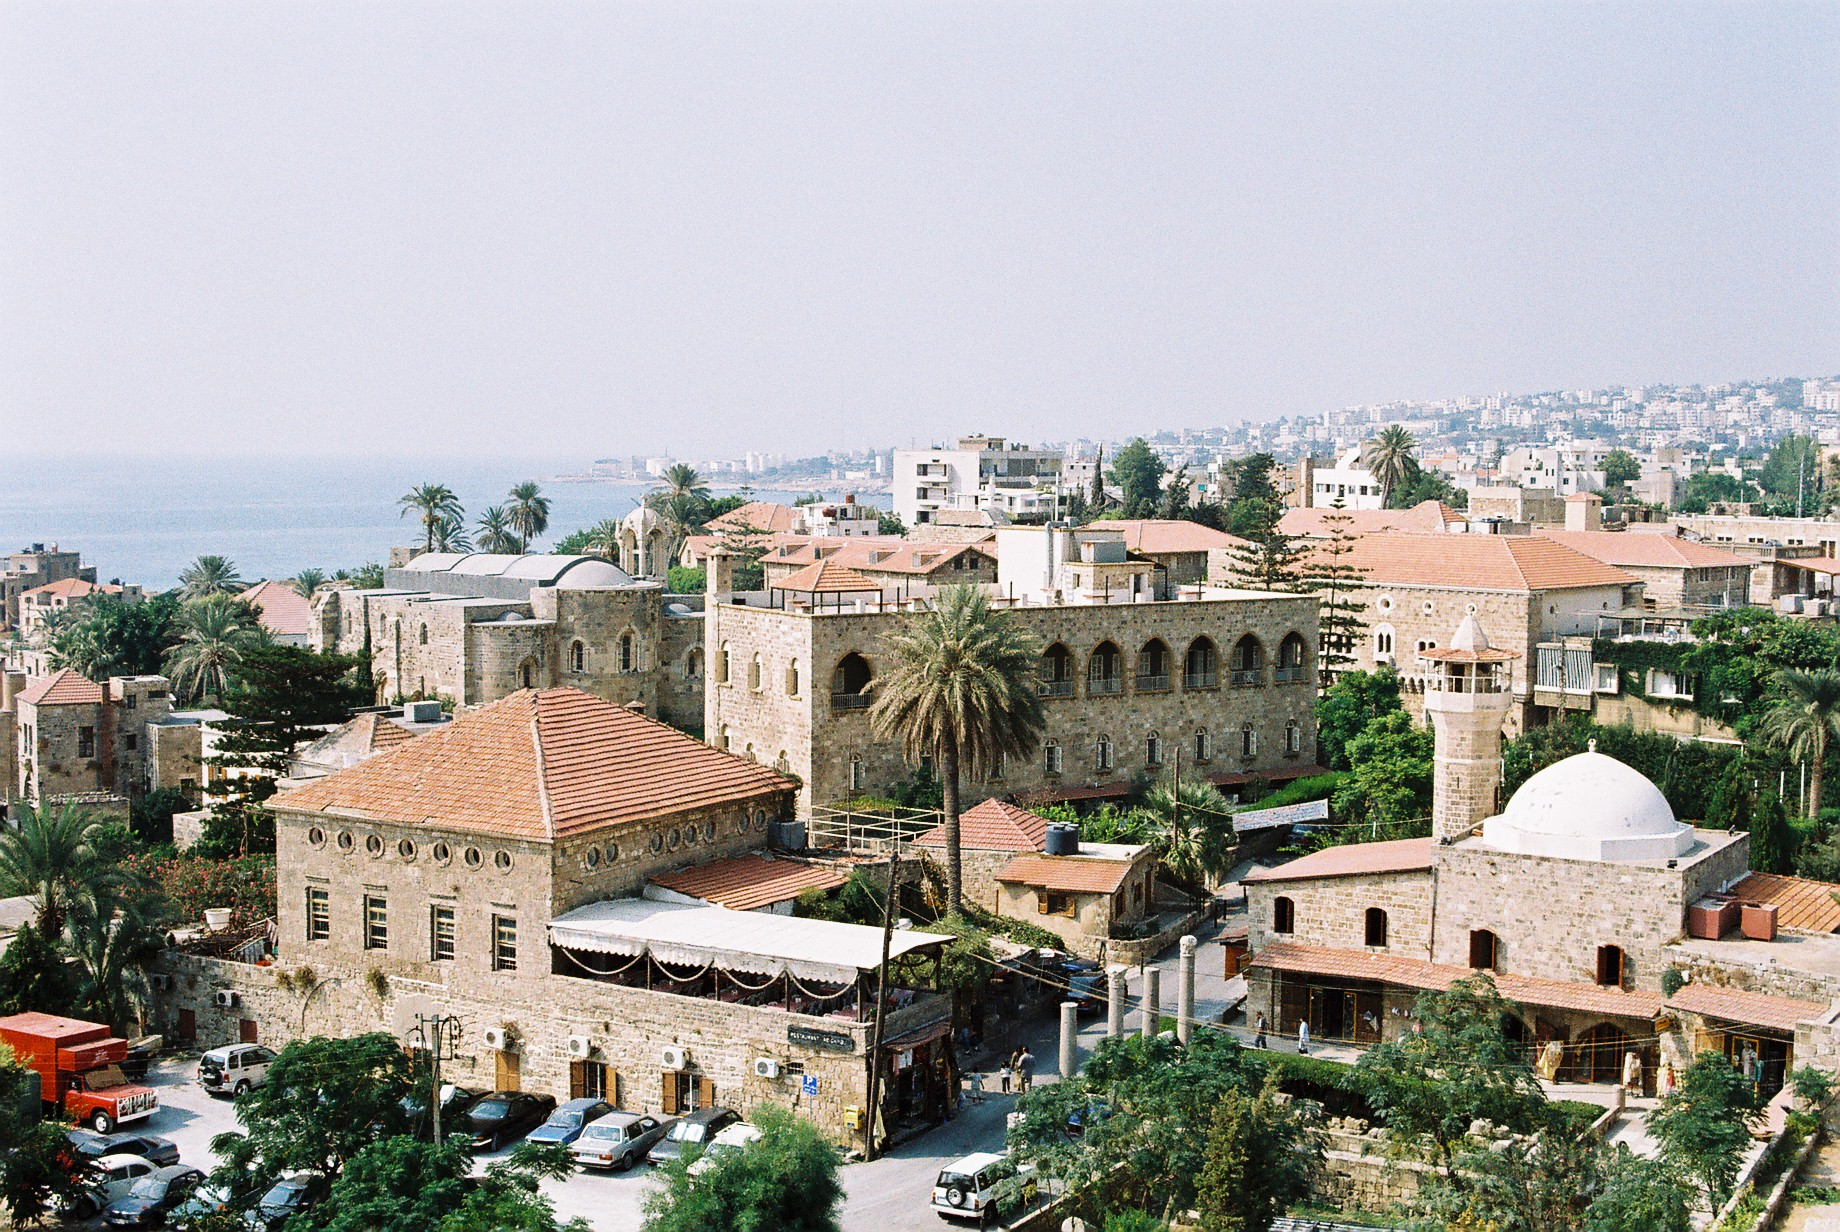 Države po abecedi u slici Byblos_Libanon_2003